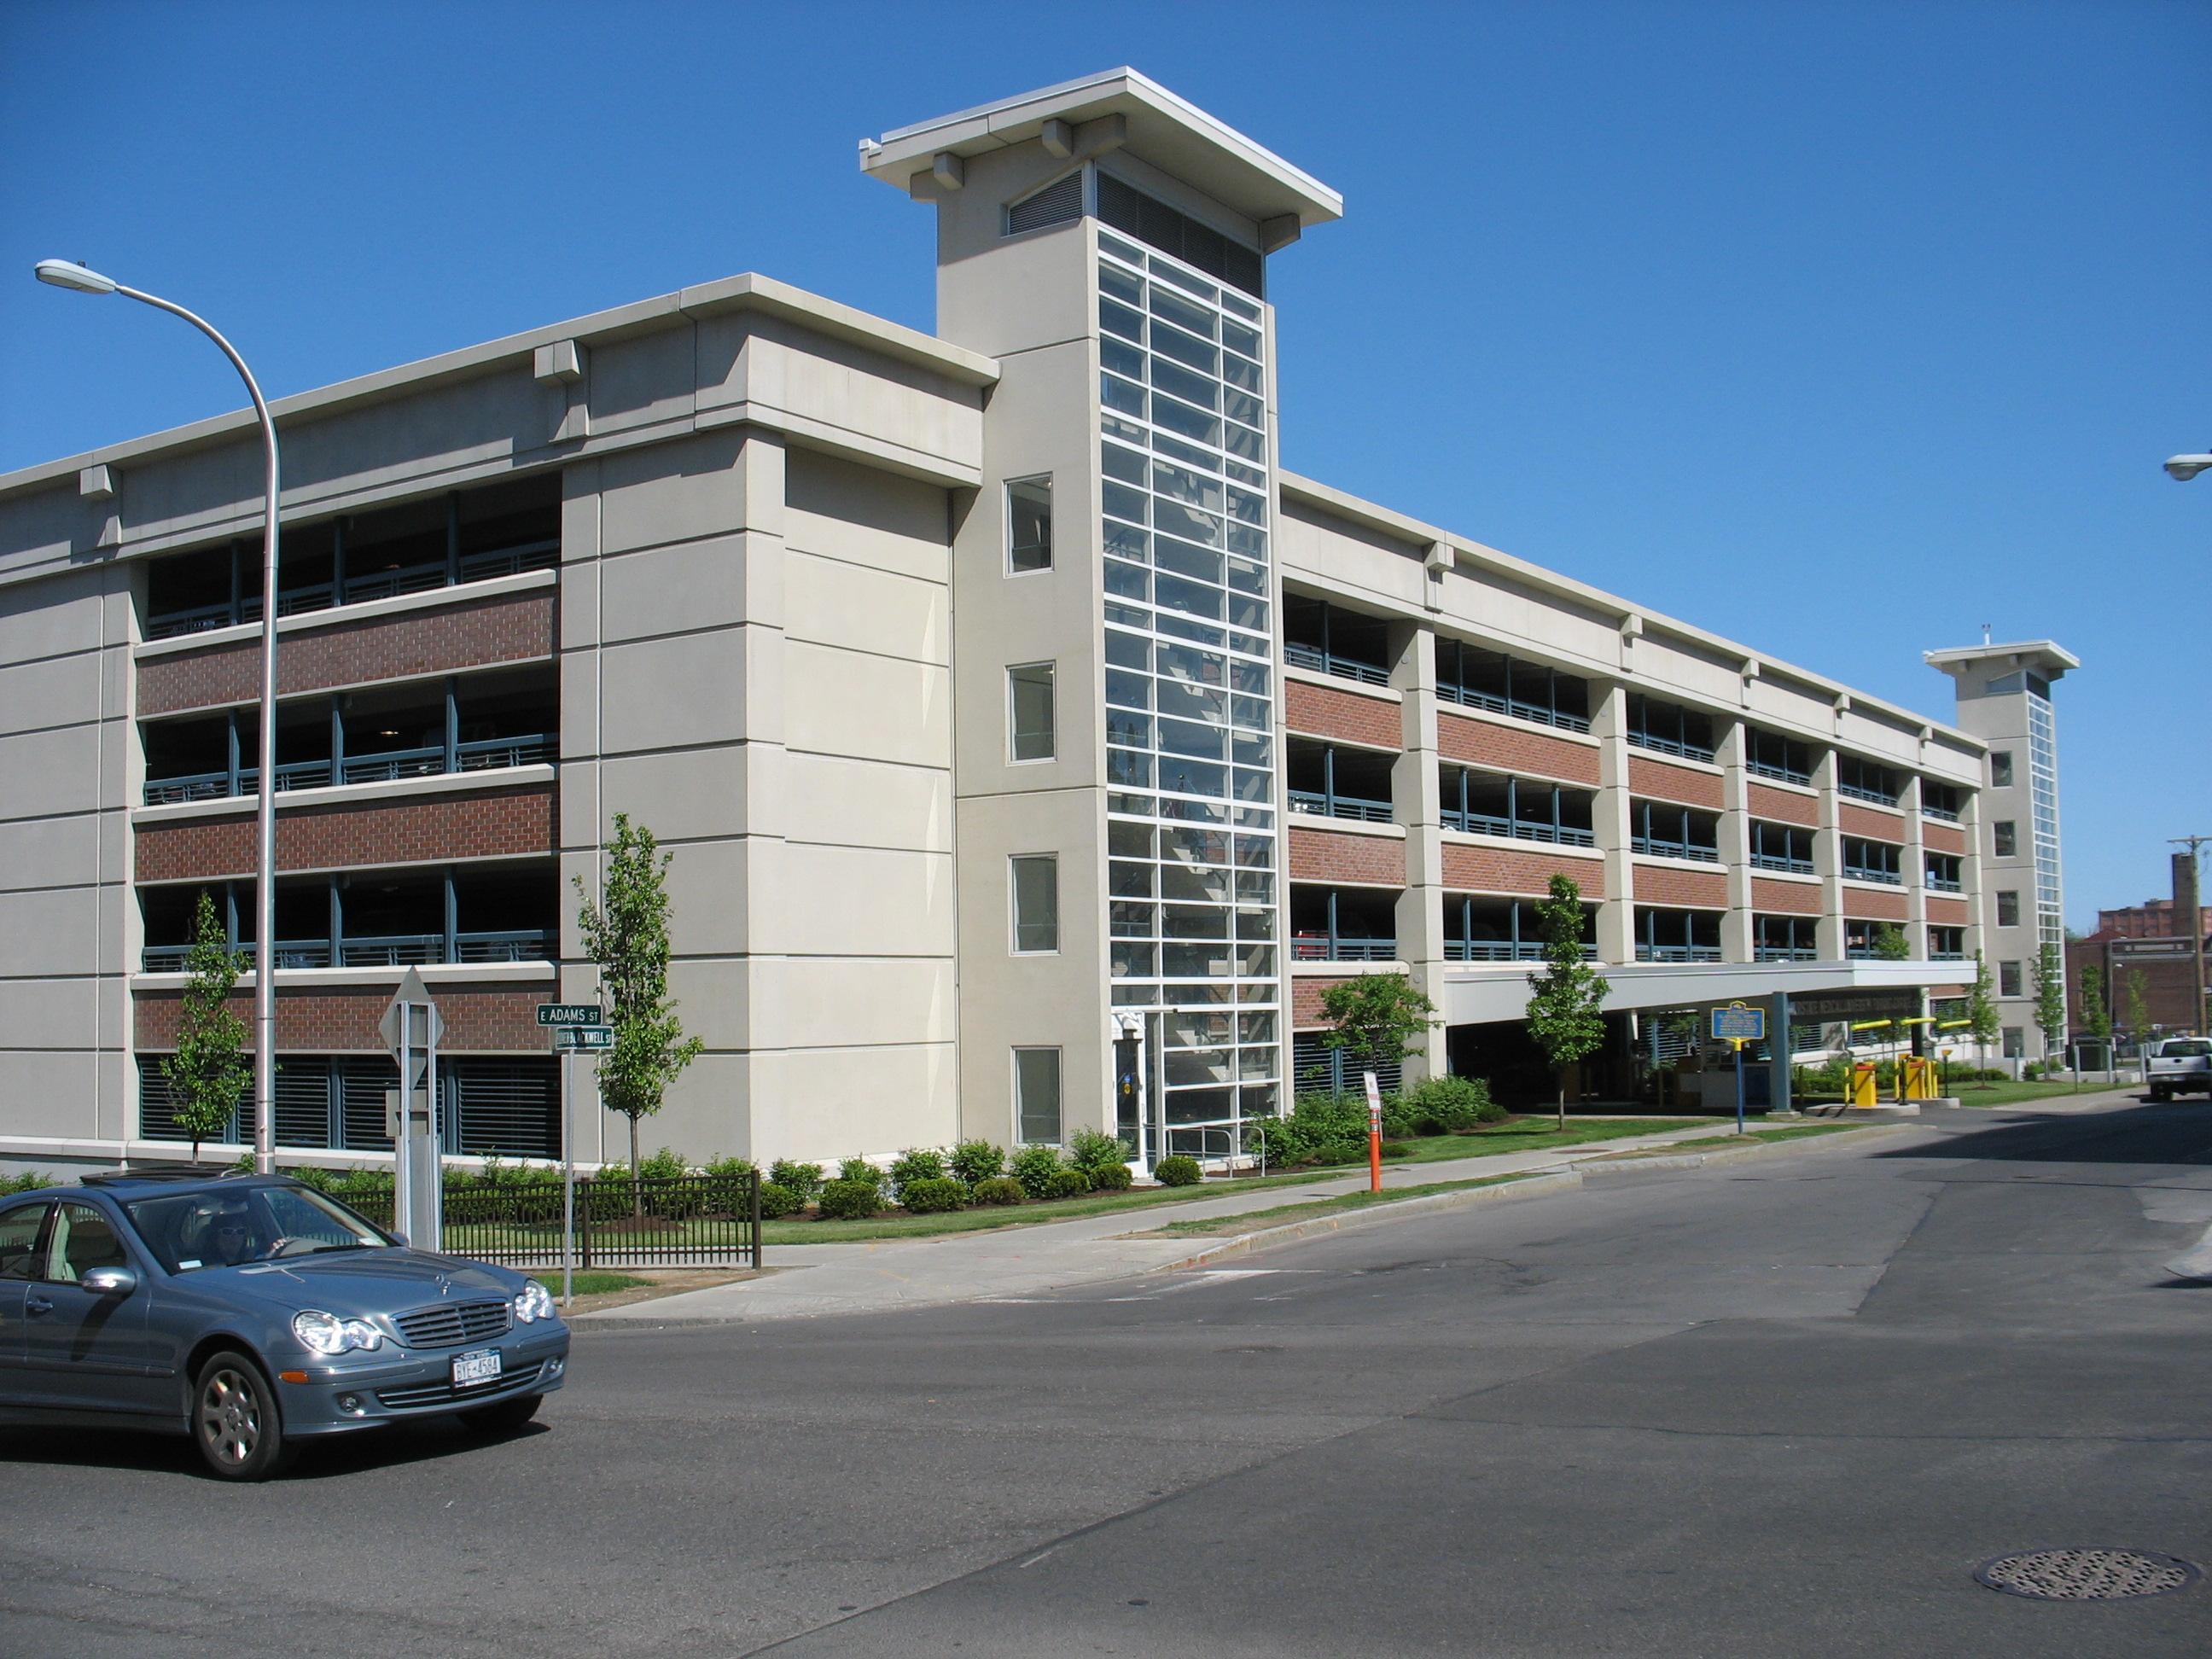 John P. Stopen SUNY Upstate Parking Garage exterior